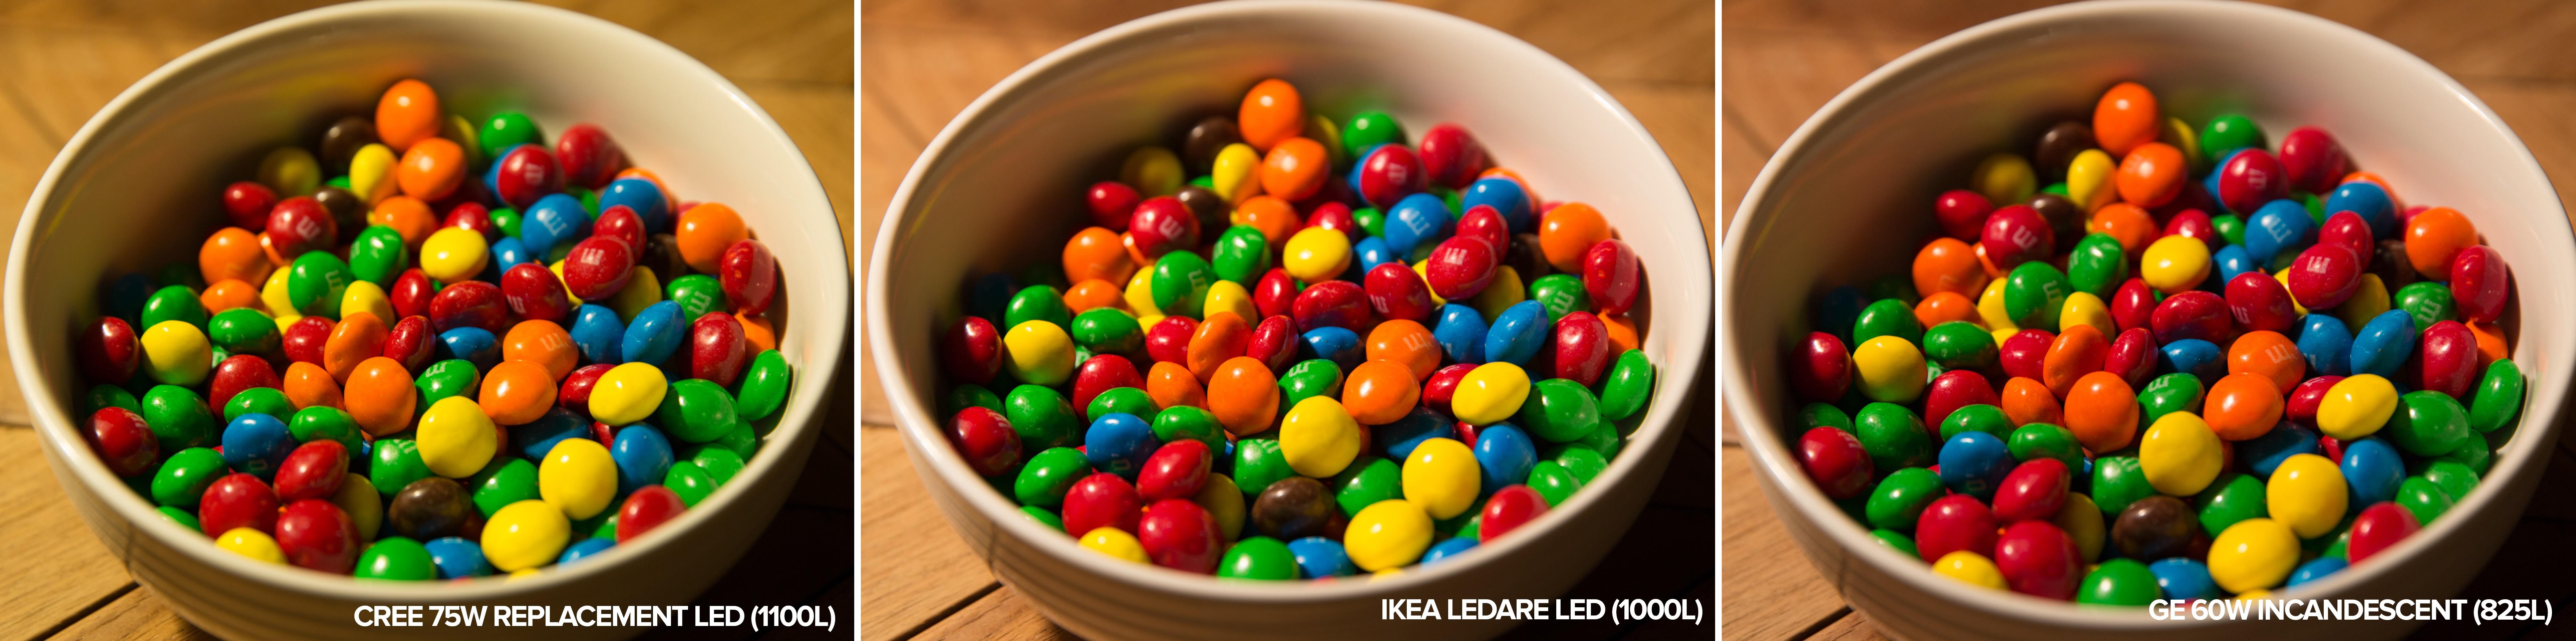 ikea-ledare-1000l-led-cri-comparison-shots-cree-75w-ge.jpg